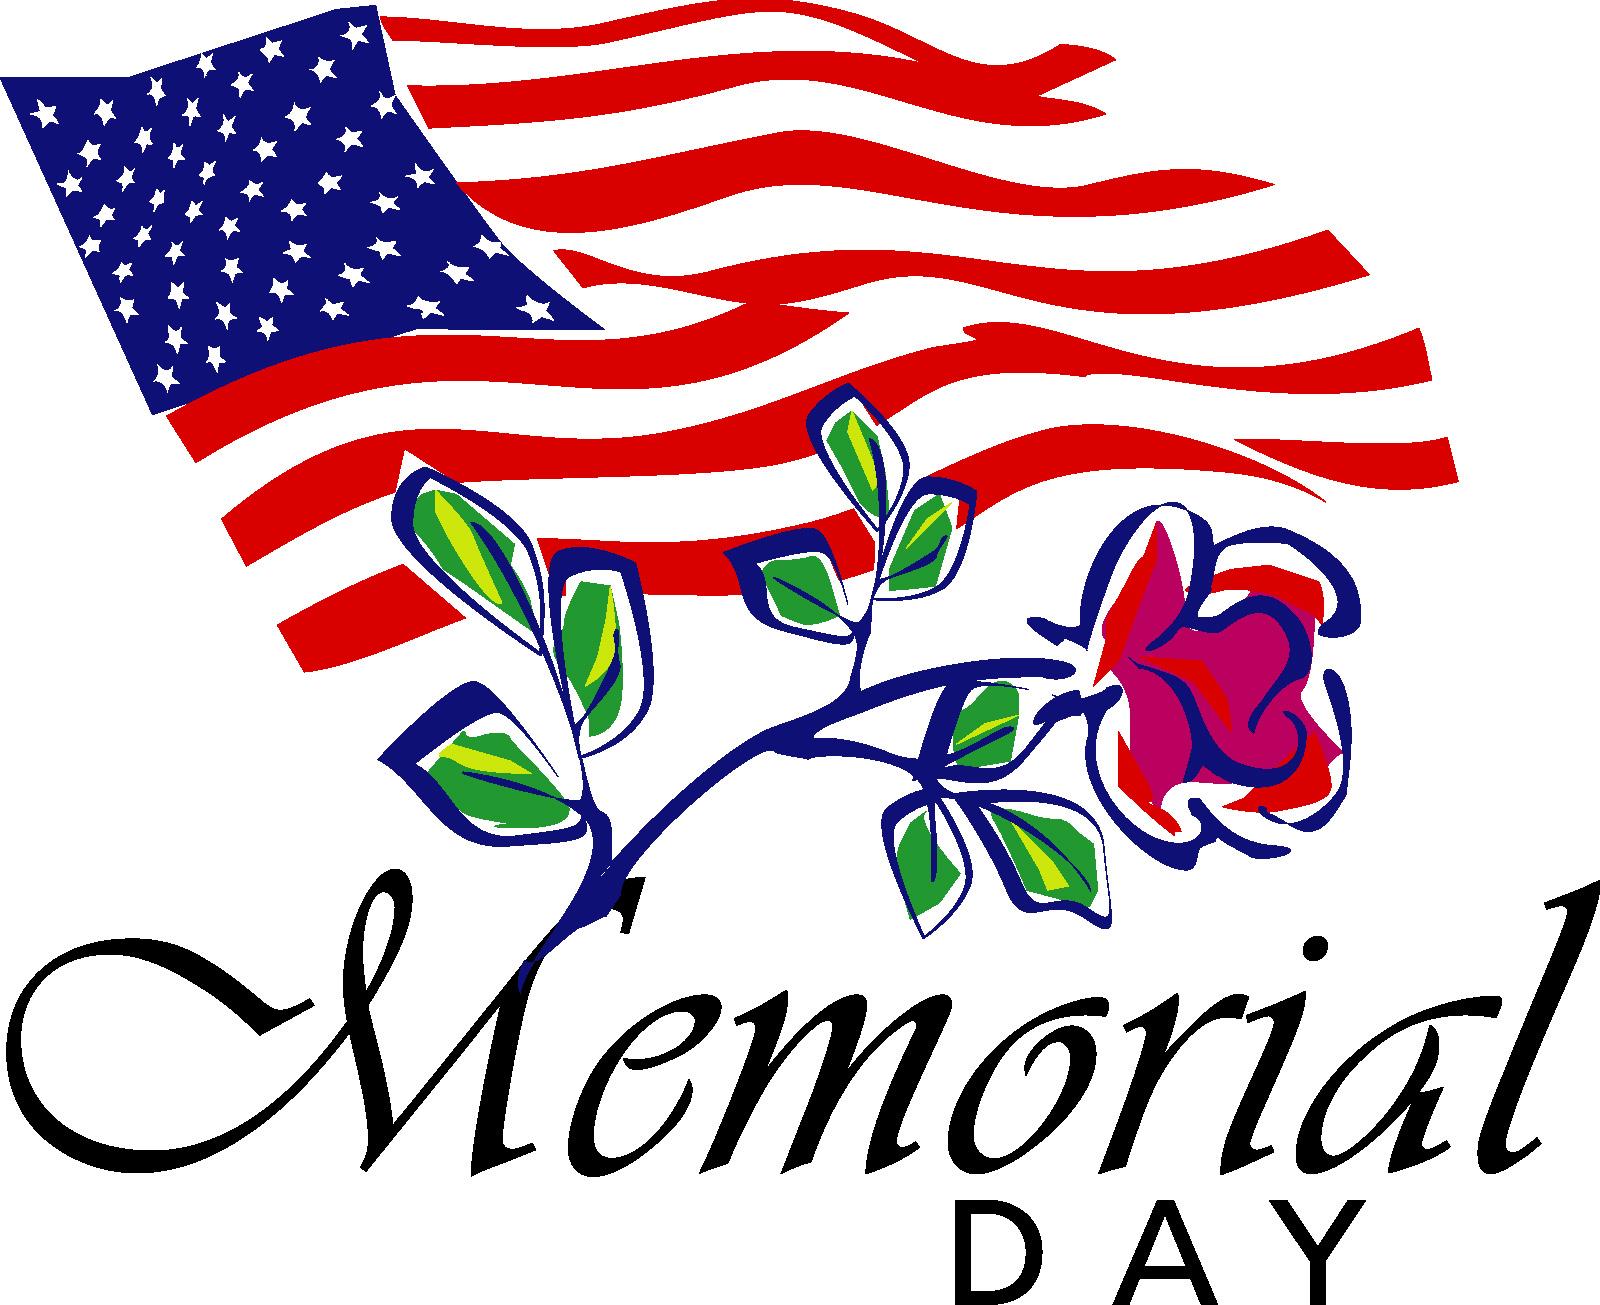 Free memorial day clip art image 2 image